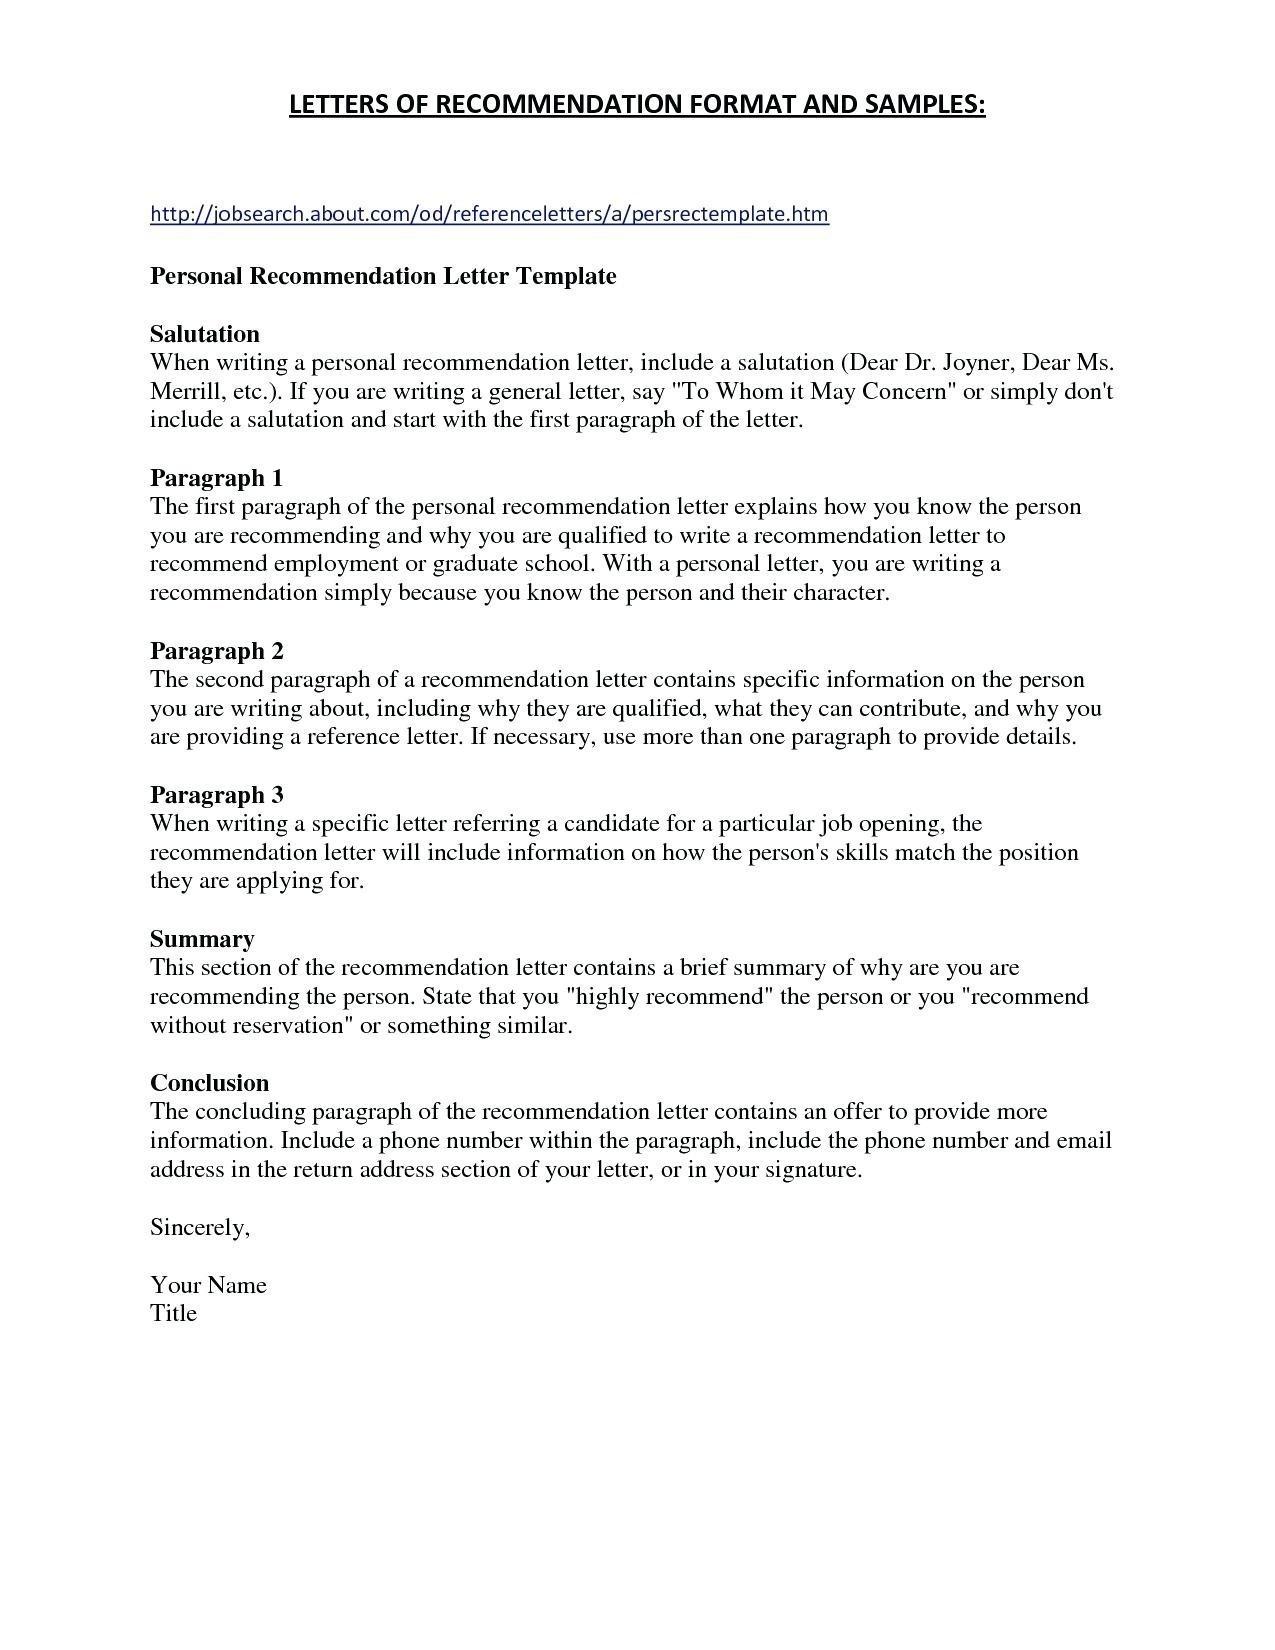 Landlord Reference Letter Template - Blendbend Wp Content 2018 07 Landlord